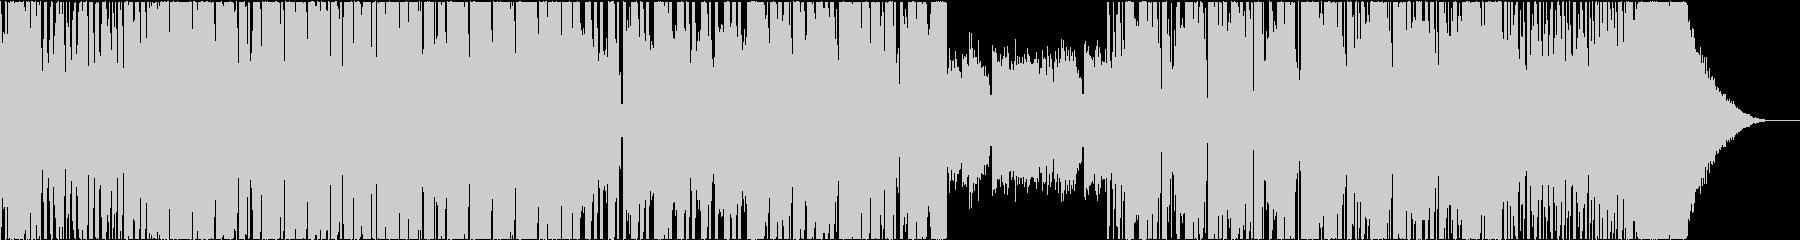 EDM TRAP DUBSTEP ピアノの未再生の波形